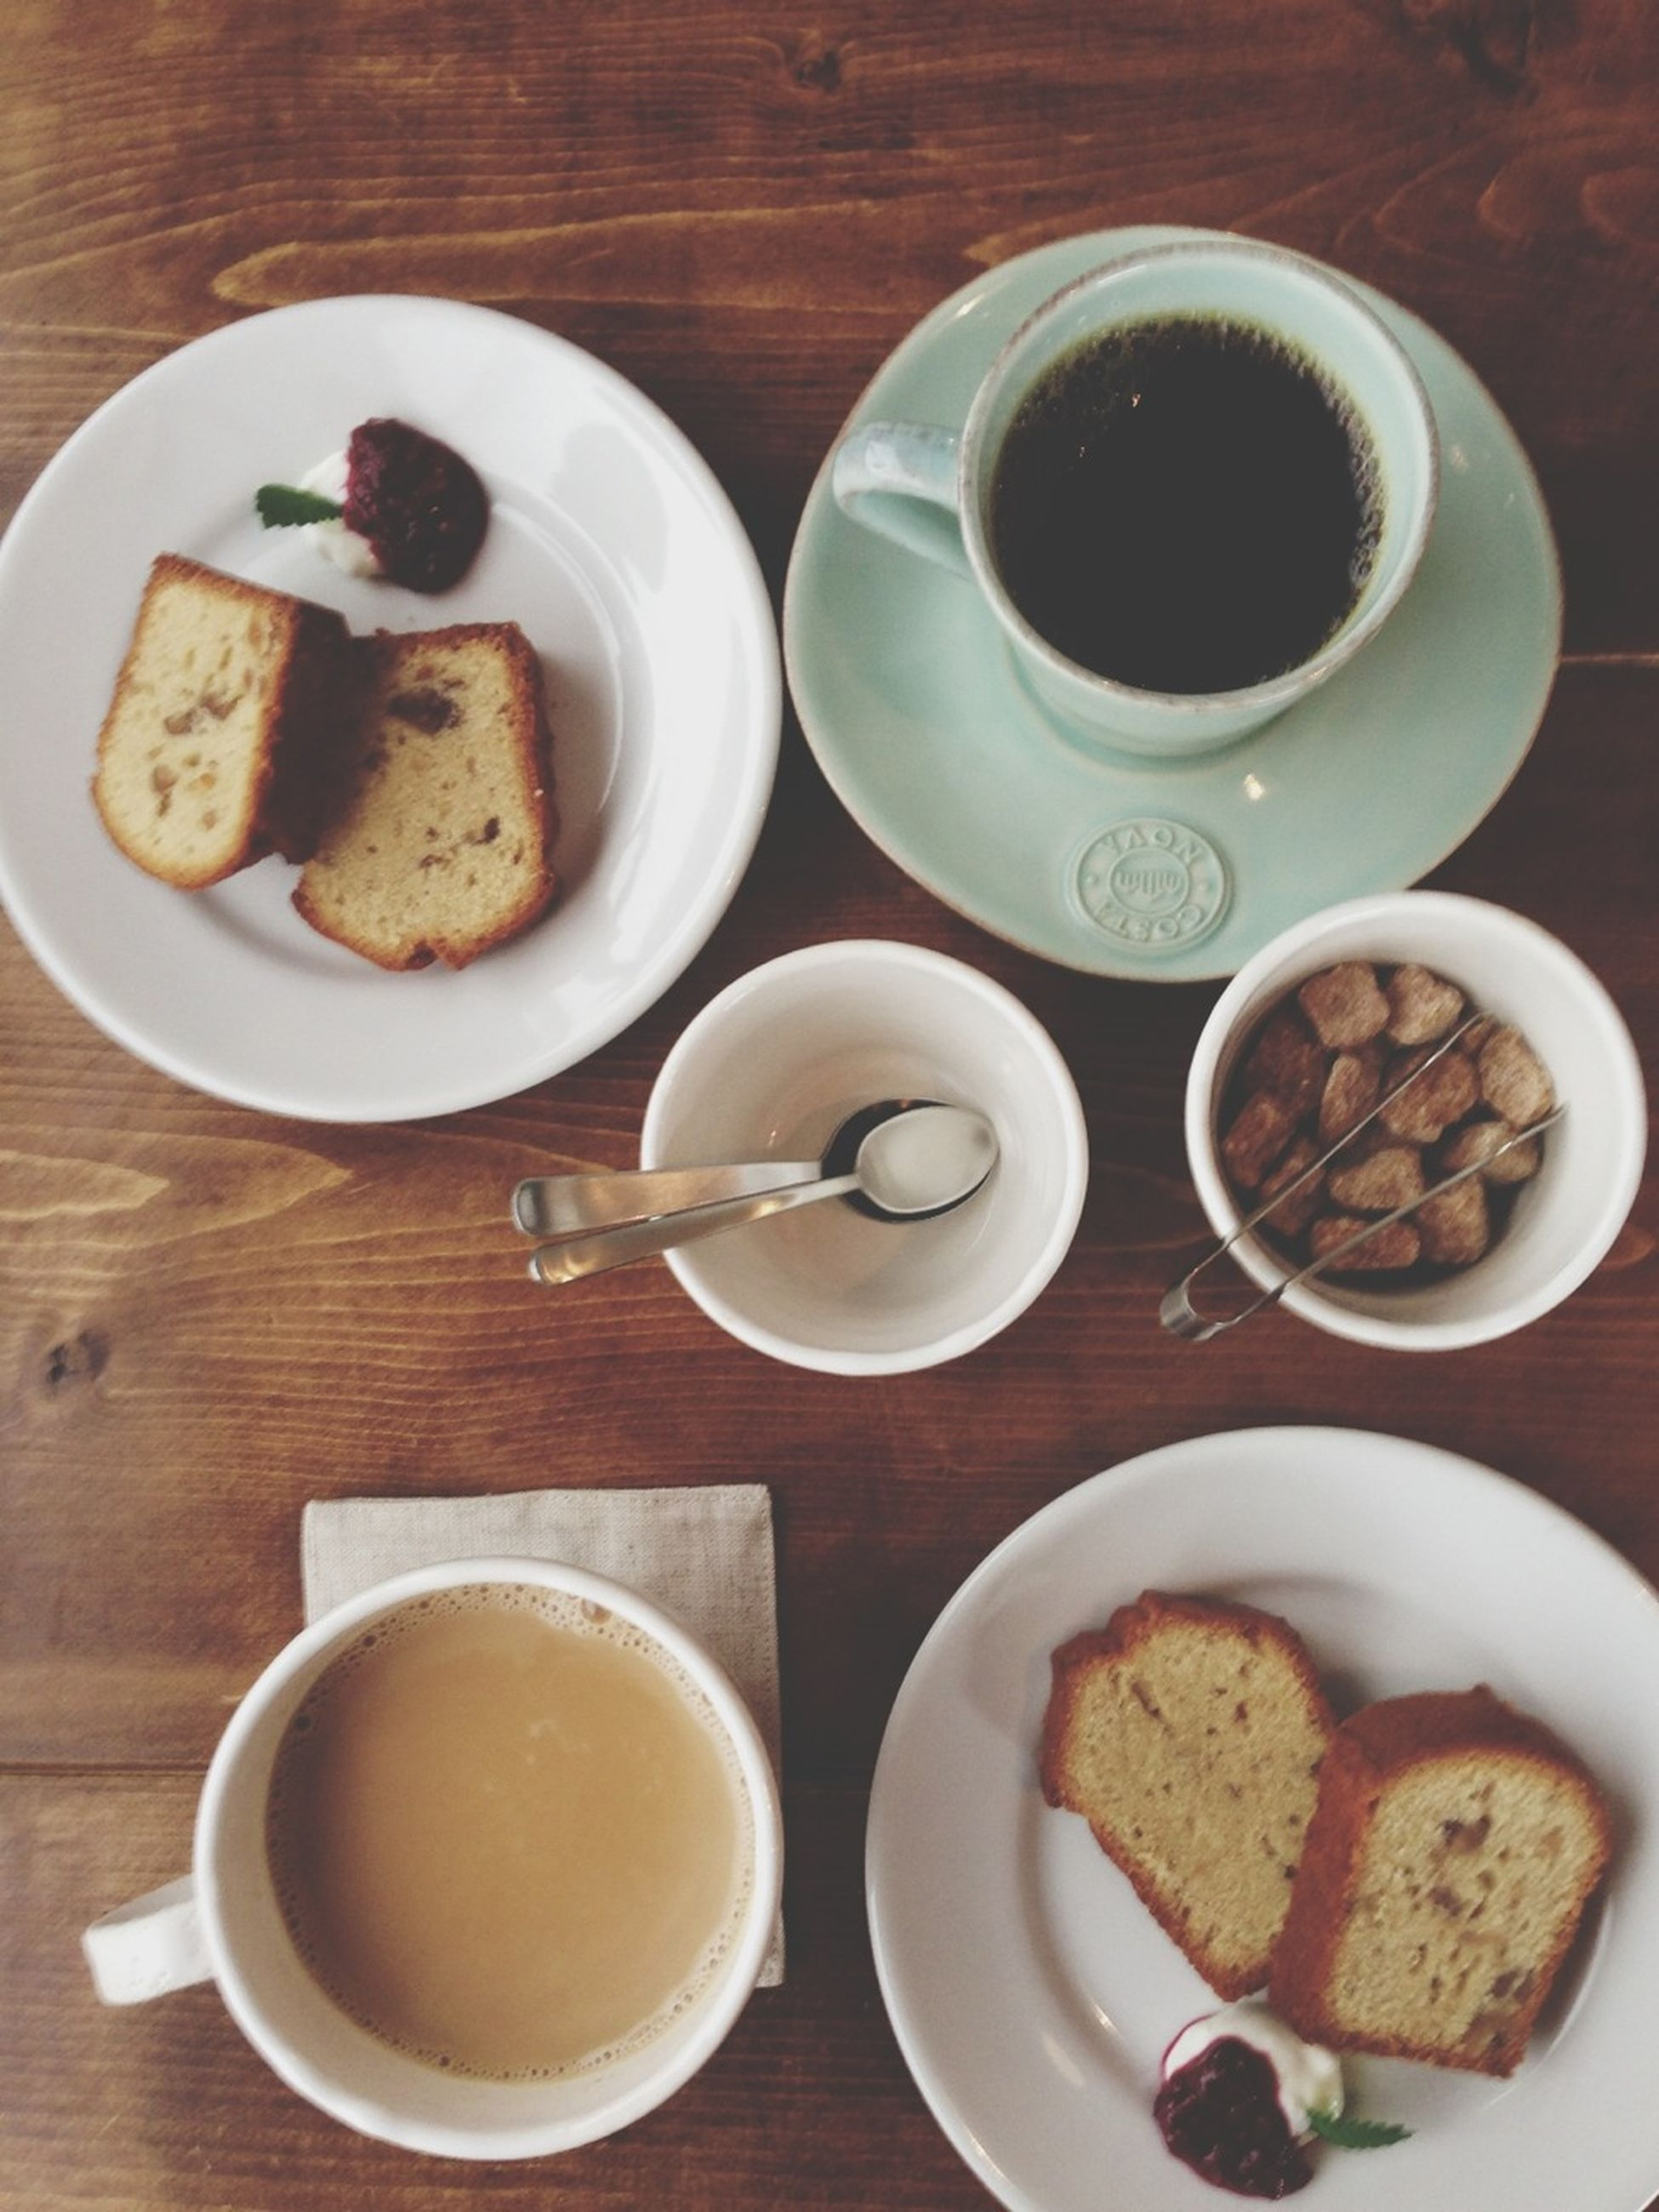 Coffee Goodafternoon Cakes